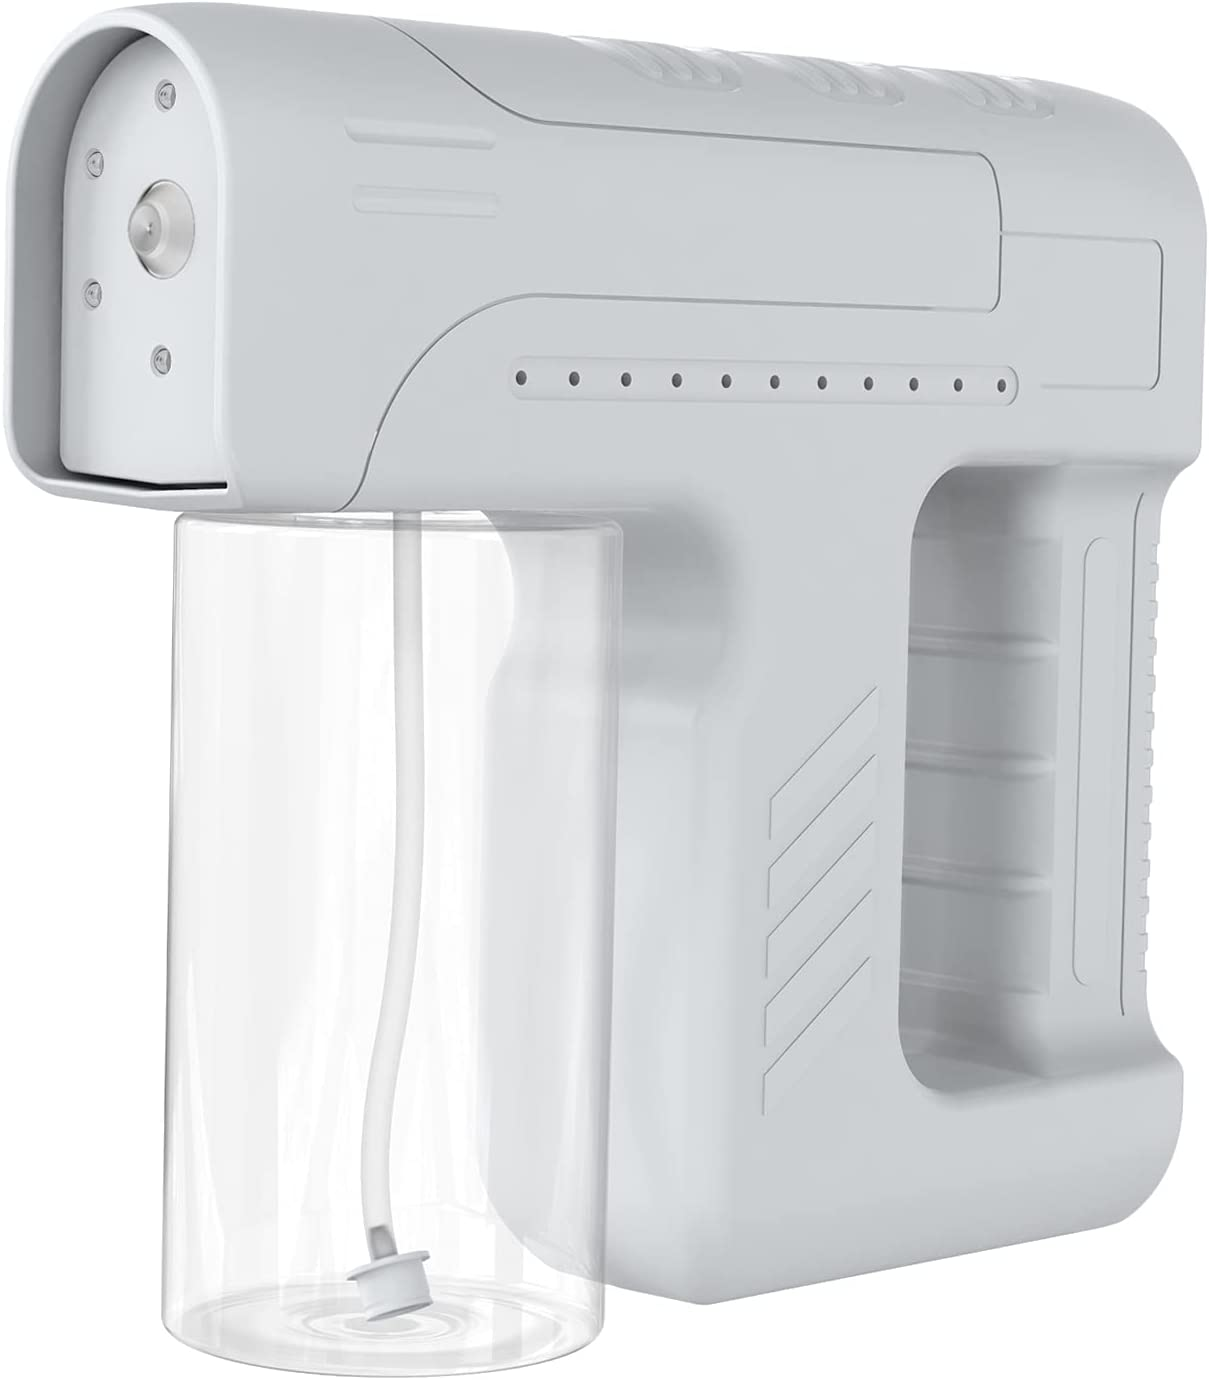 MagiDeal Wireless Nano Sprayer Gun Limited time Over item handling ☆ trial price 30 Handheld Sanitizer Fogger